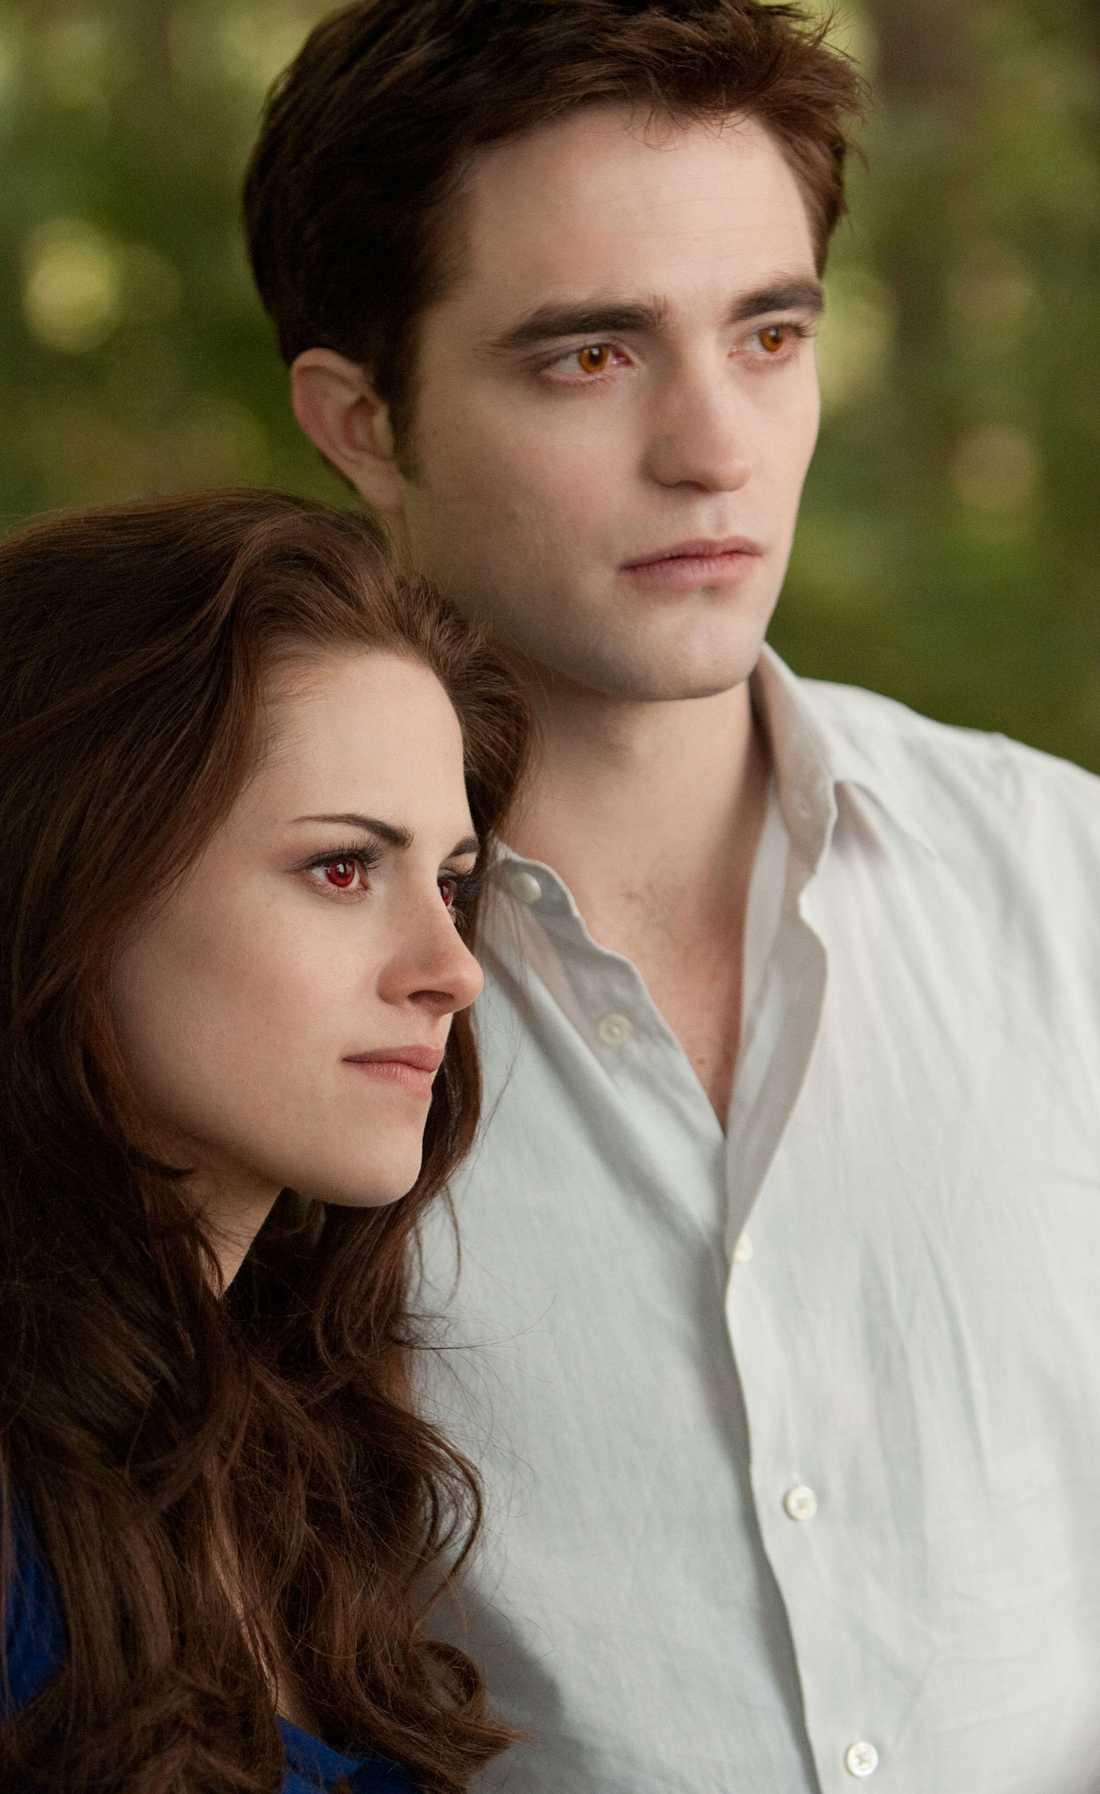 Stewart som Bella Swan och Pattinson som Edward Cullen.